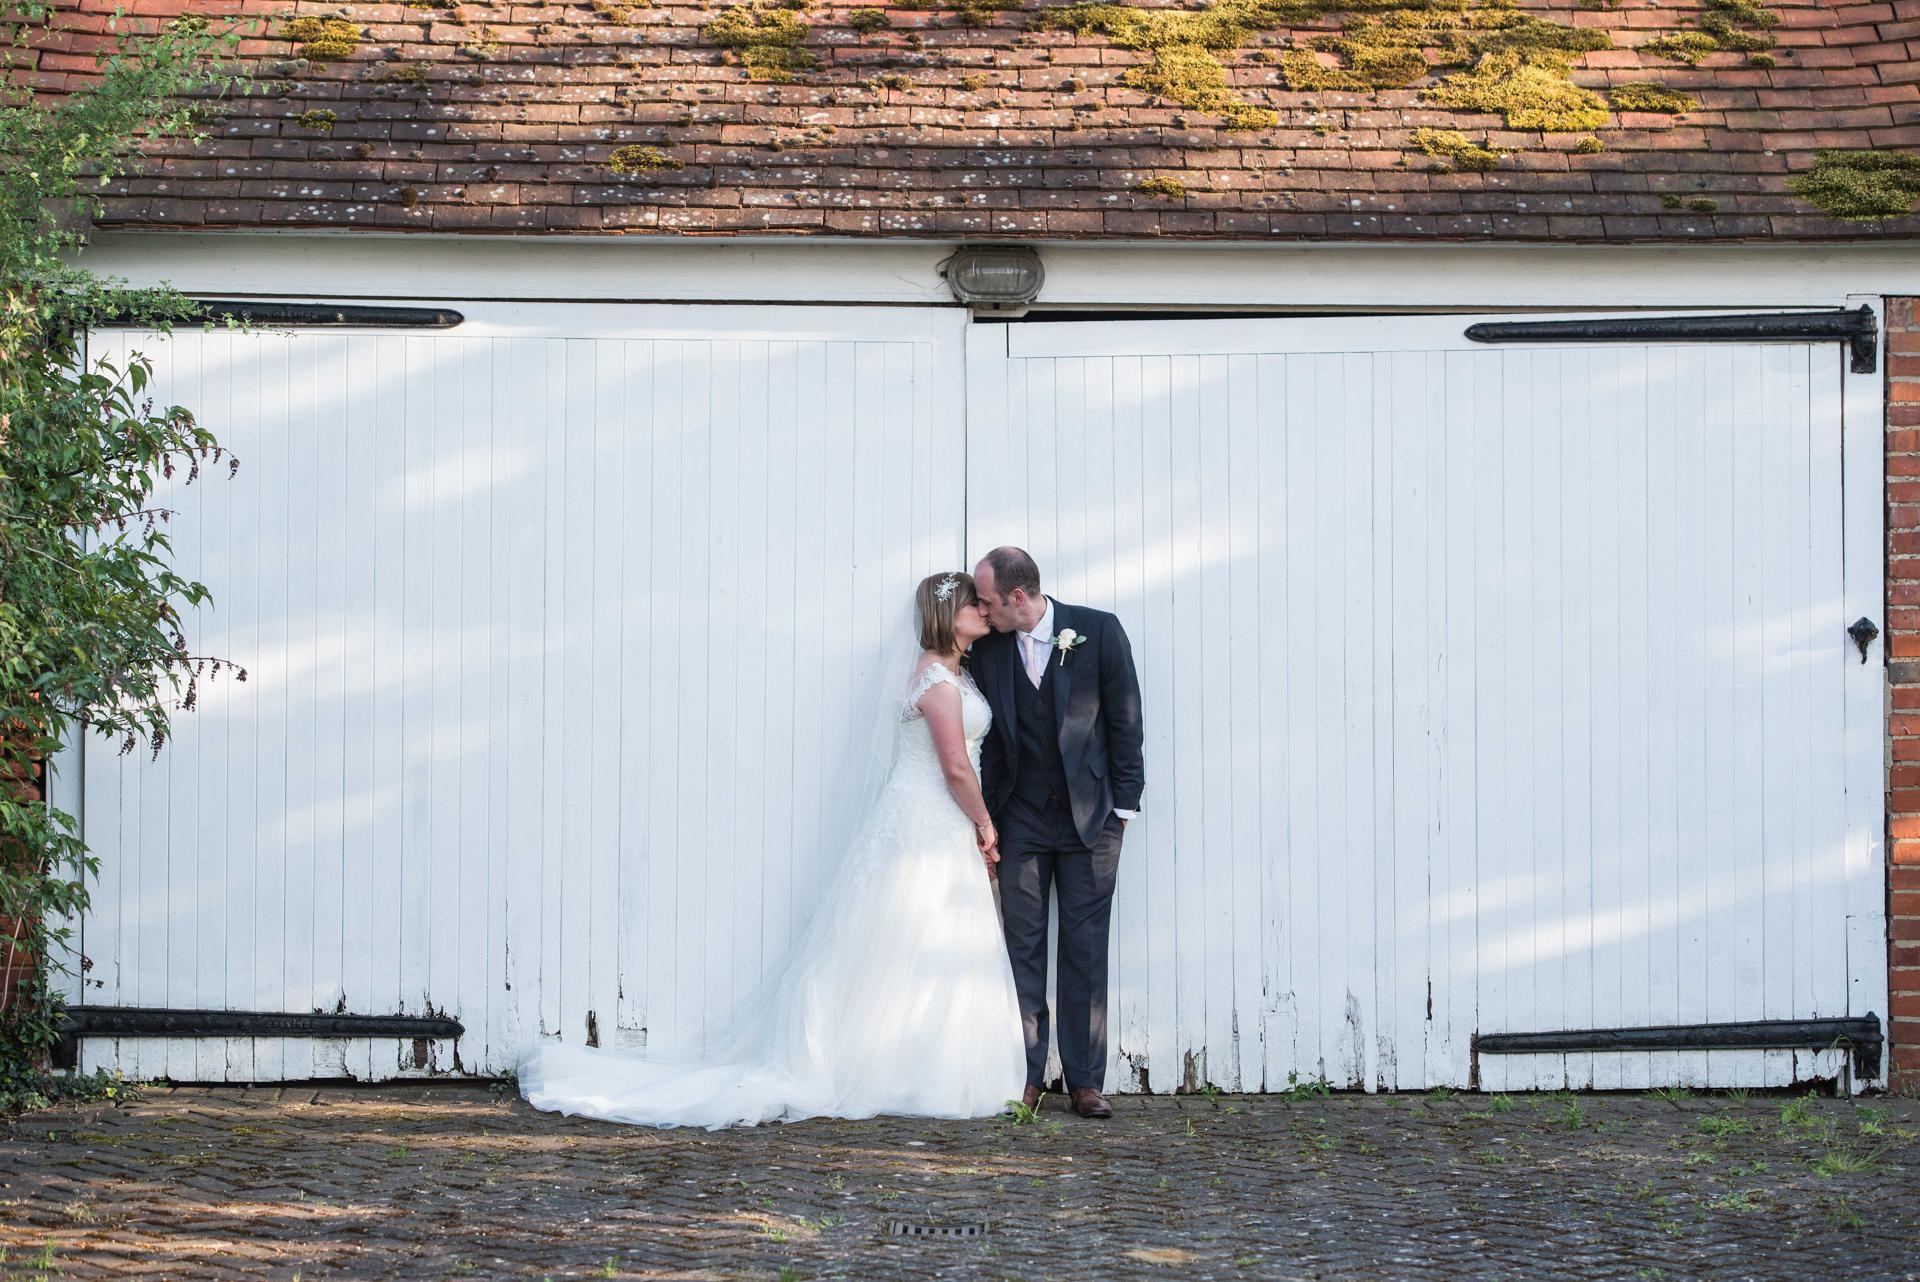 Lillibrook Manor Barn Wedding, Maidenhead, Alexandria Hall Photography (58 of 82).jpg